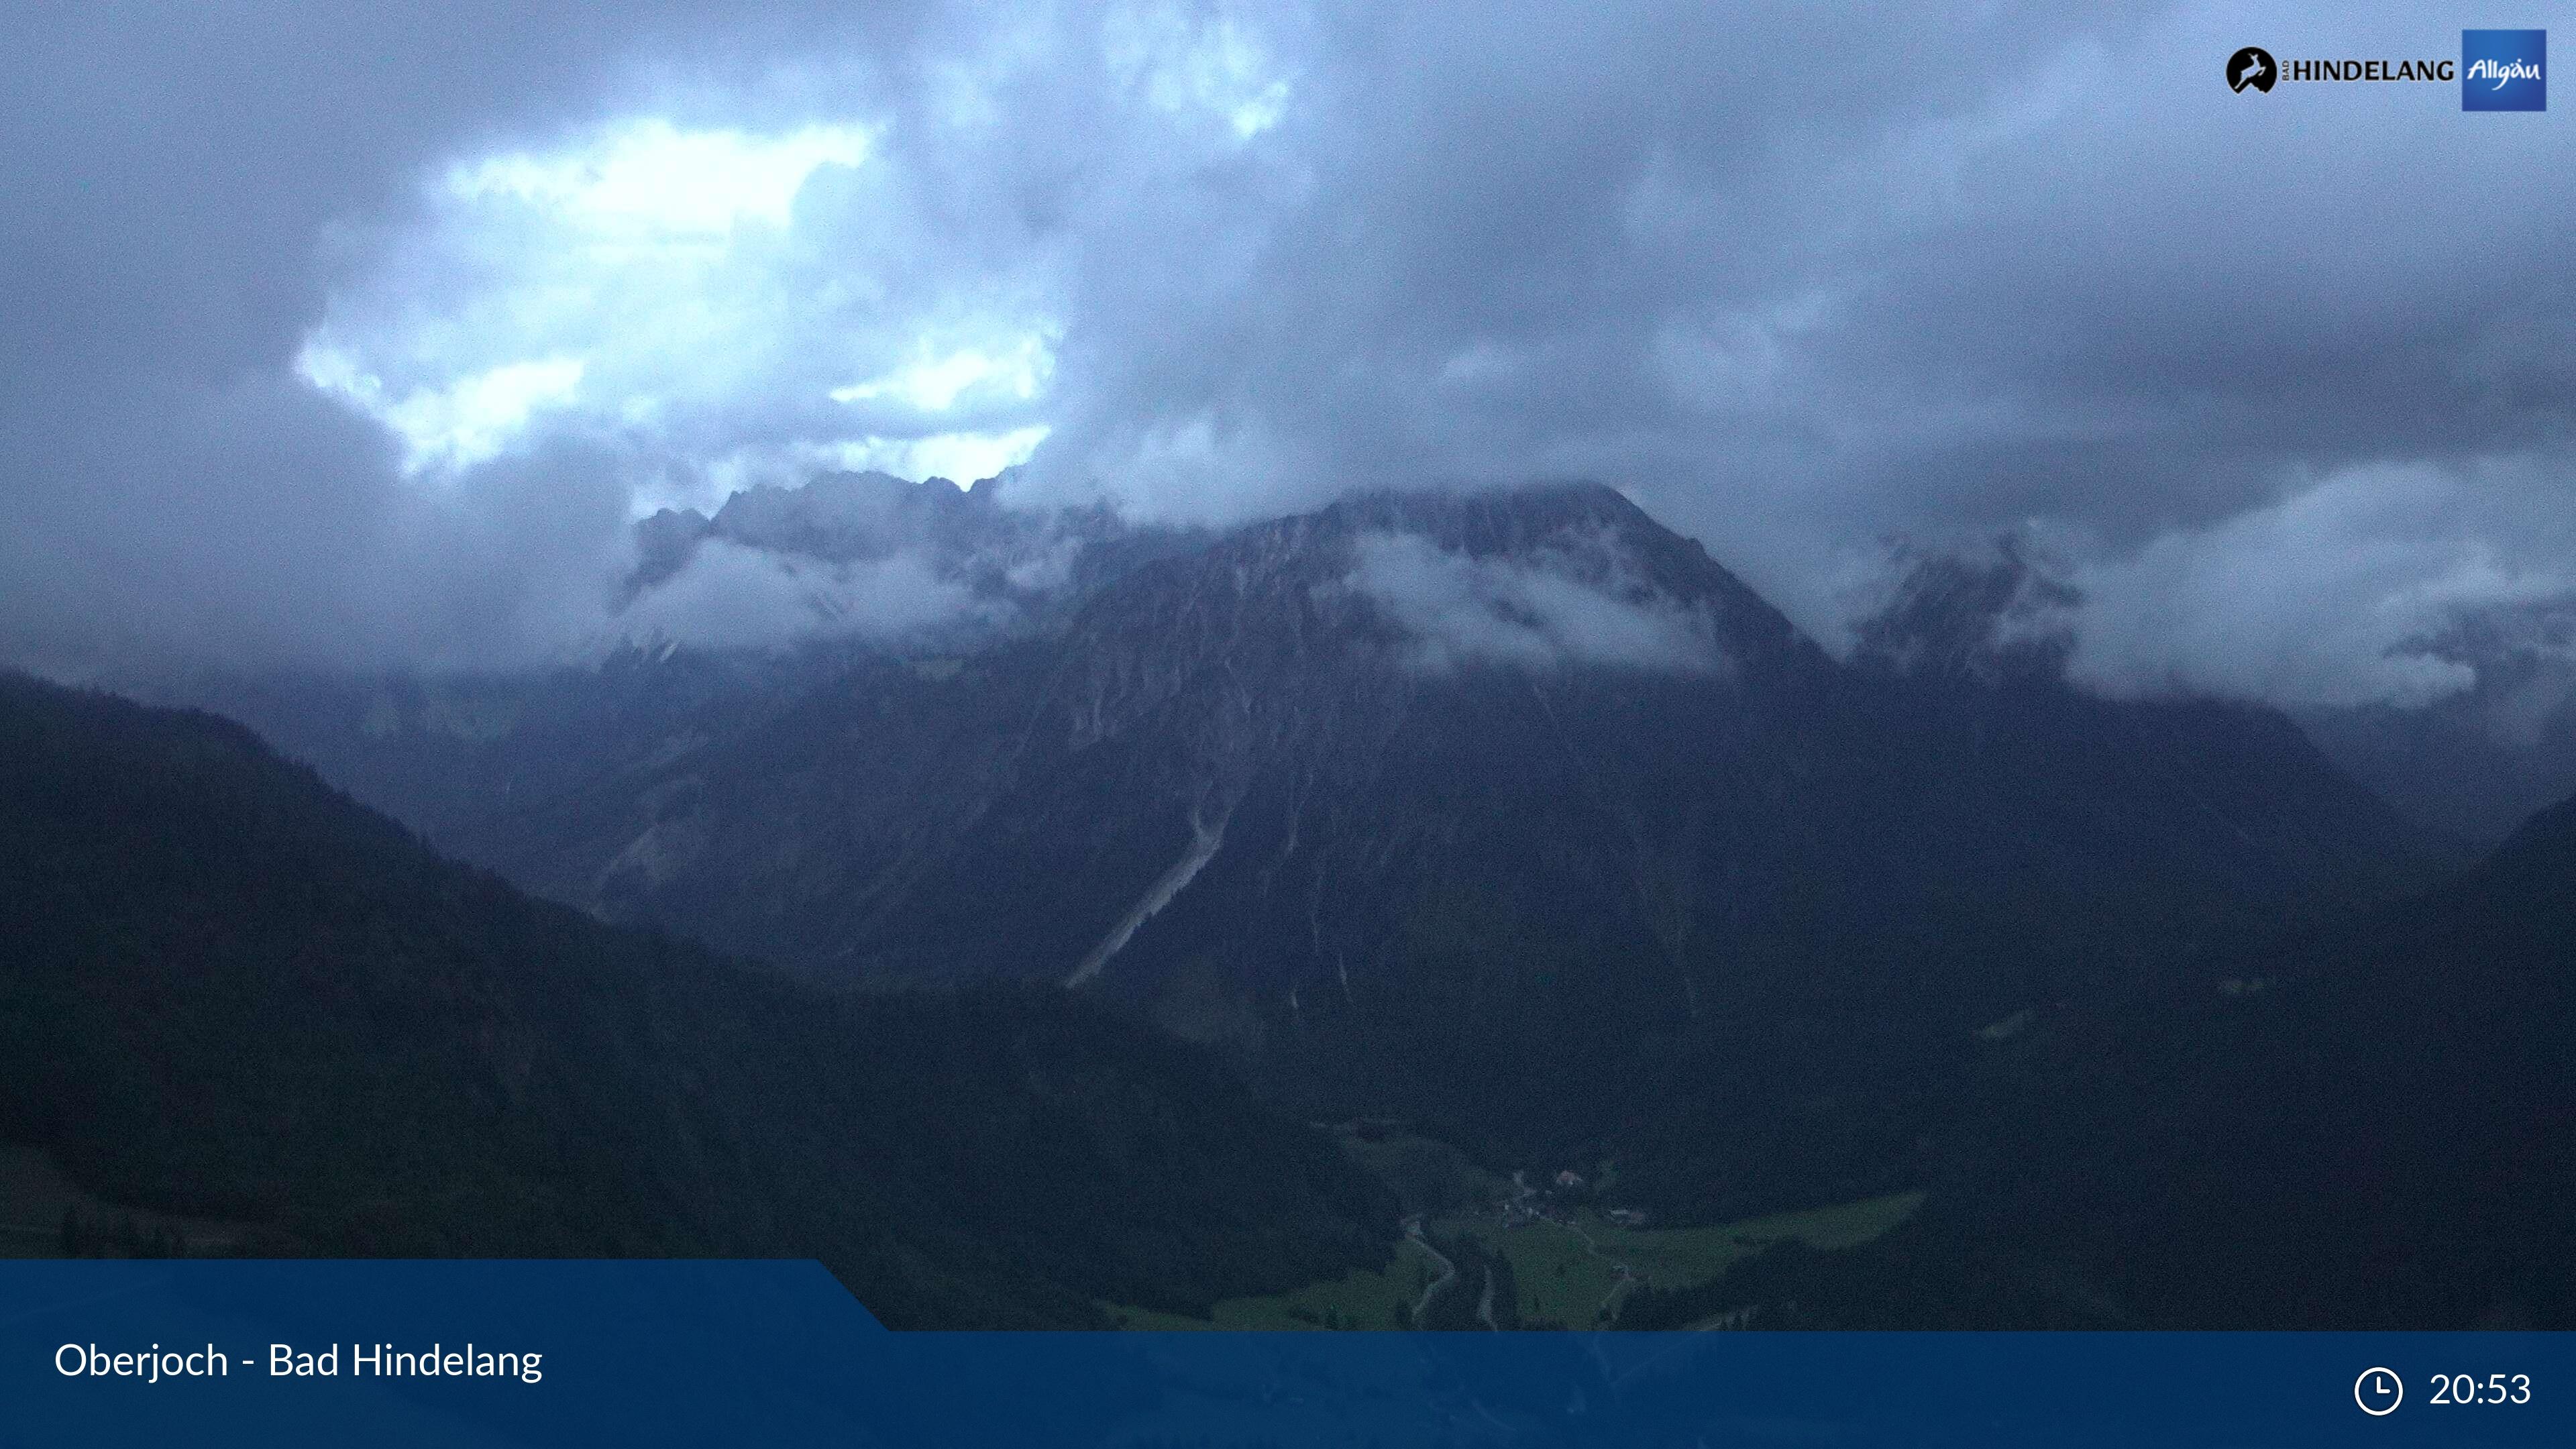 Oberjoch - Bad Hindelang